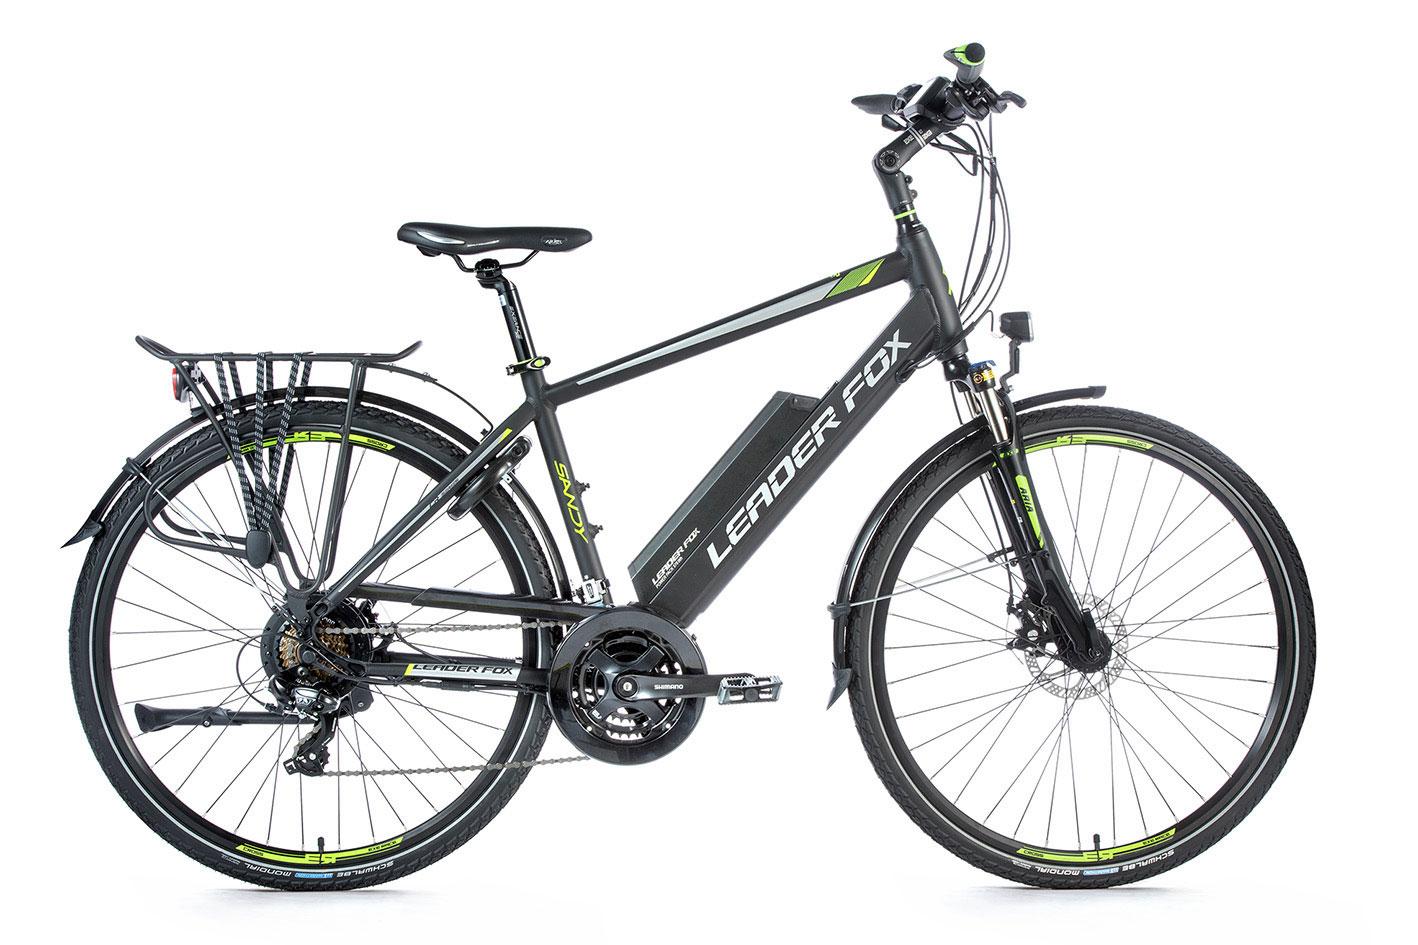 Bicicleta electrica trekking Leader Fox Sandy Gent